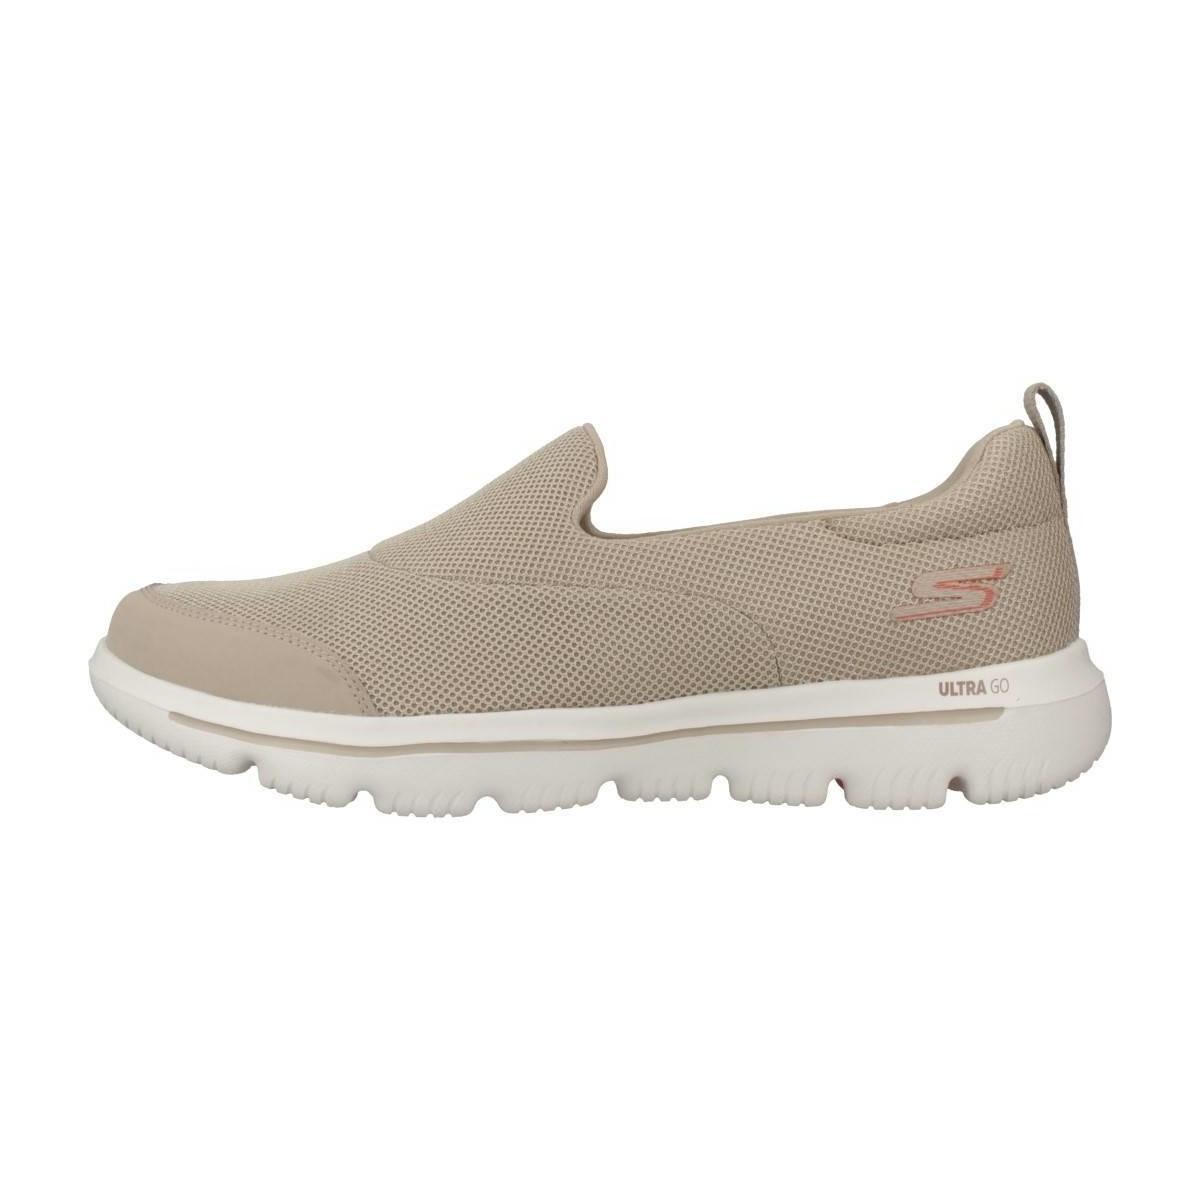 1fb629464254 Skechers - Natural Go Walk Evolution Ultra Reac Women s Shoes (trainers) In  Beige -. View fullscreen